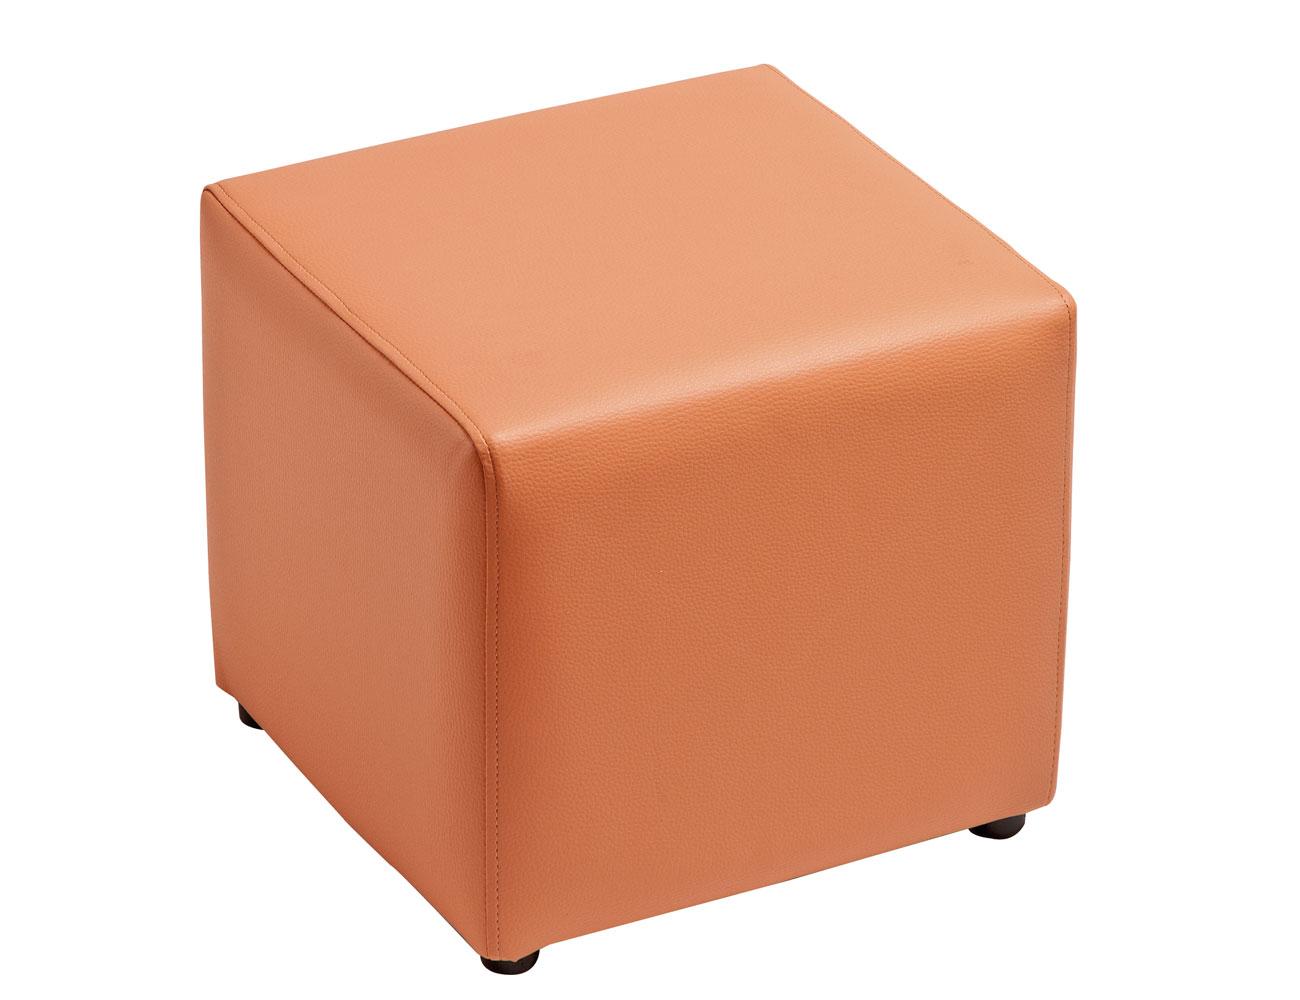 4 cuadrado fijo naranja6